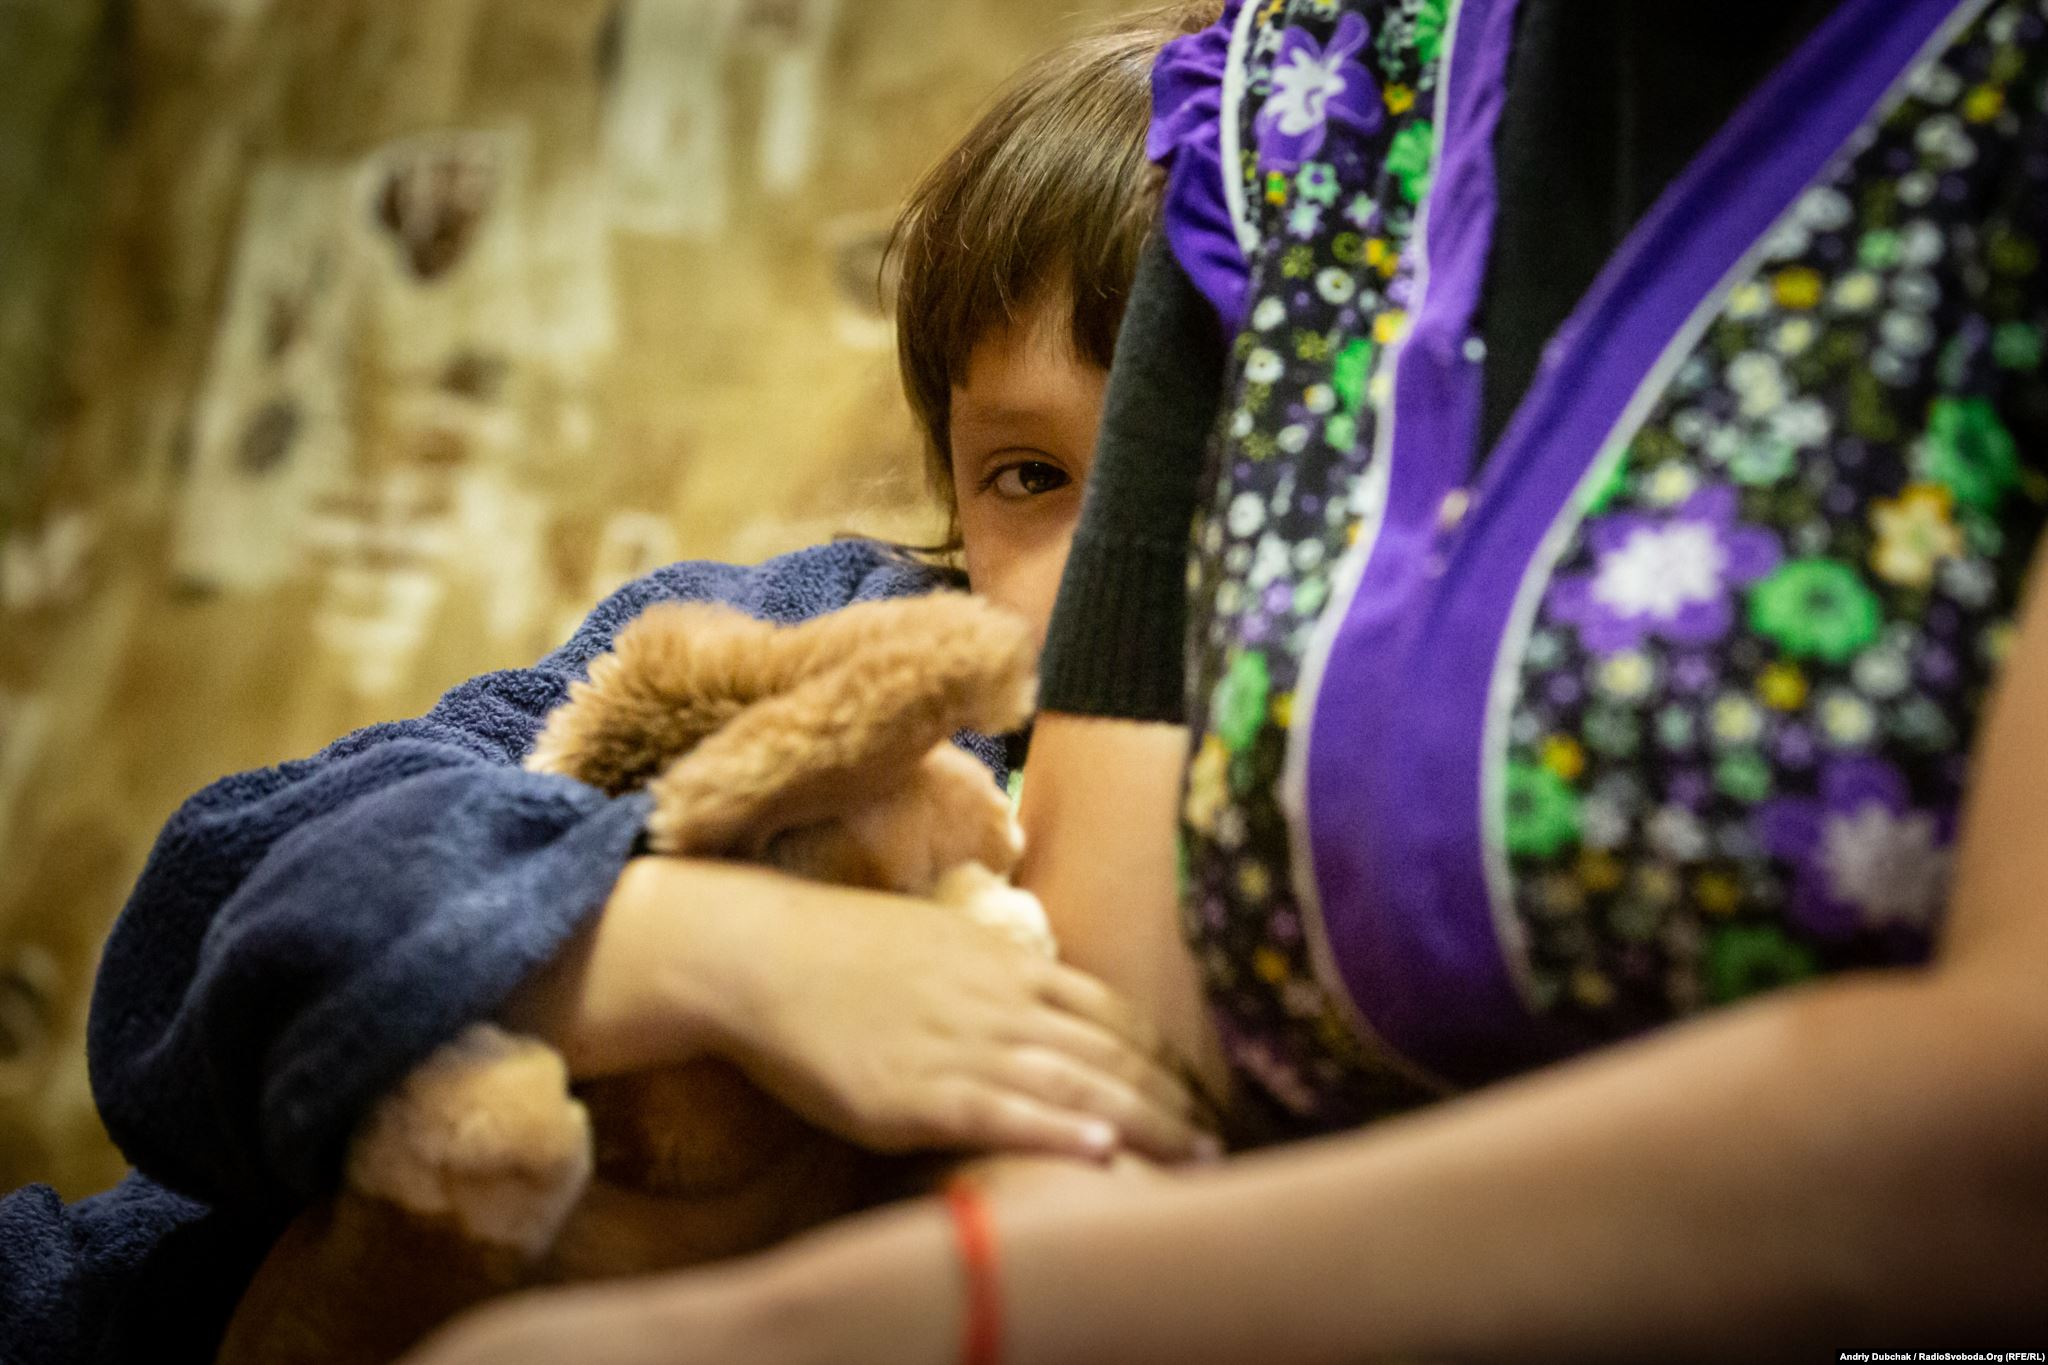 Sofia, 6, is shy with visitors in Krasnohorivka. (photo: Andriy Dubchak)